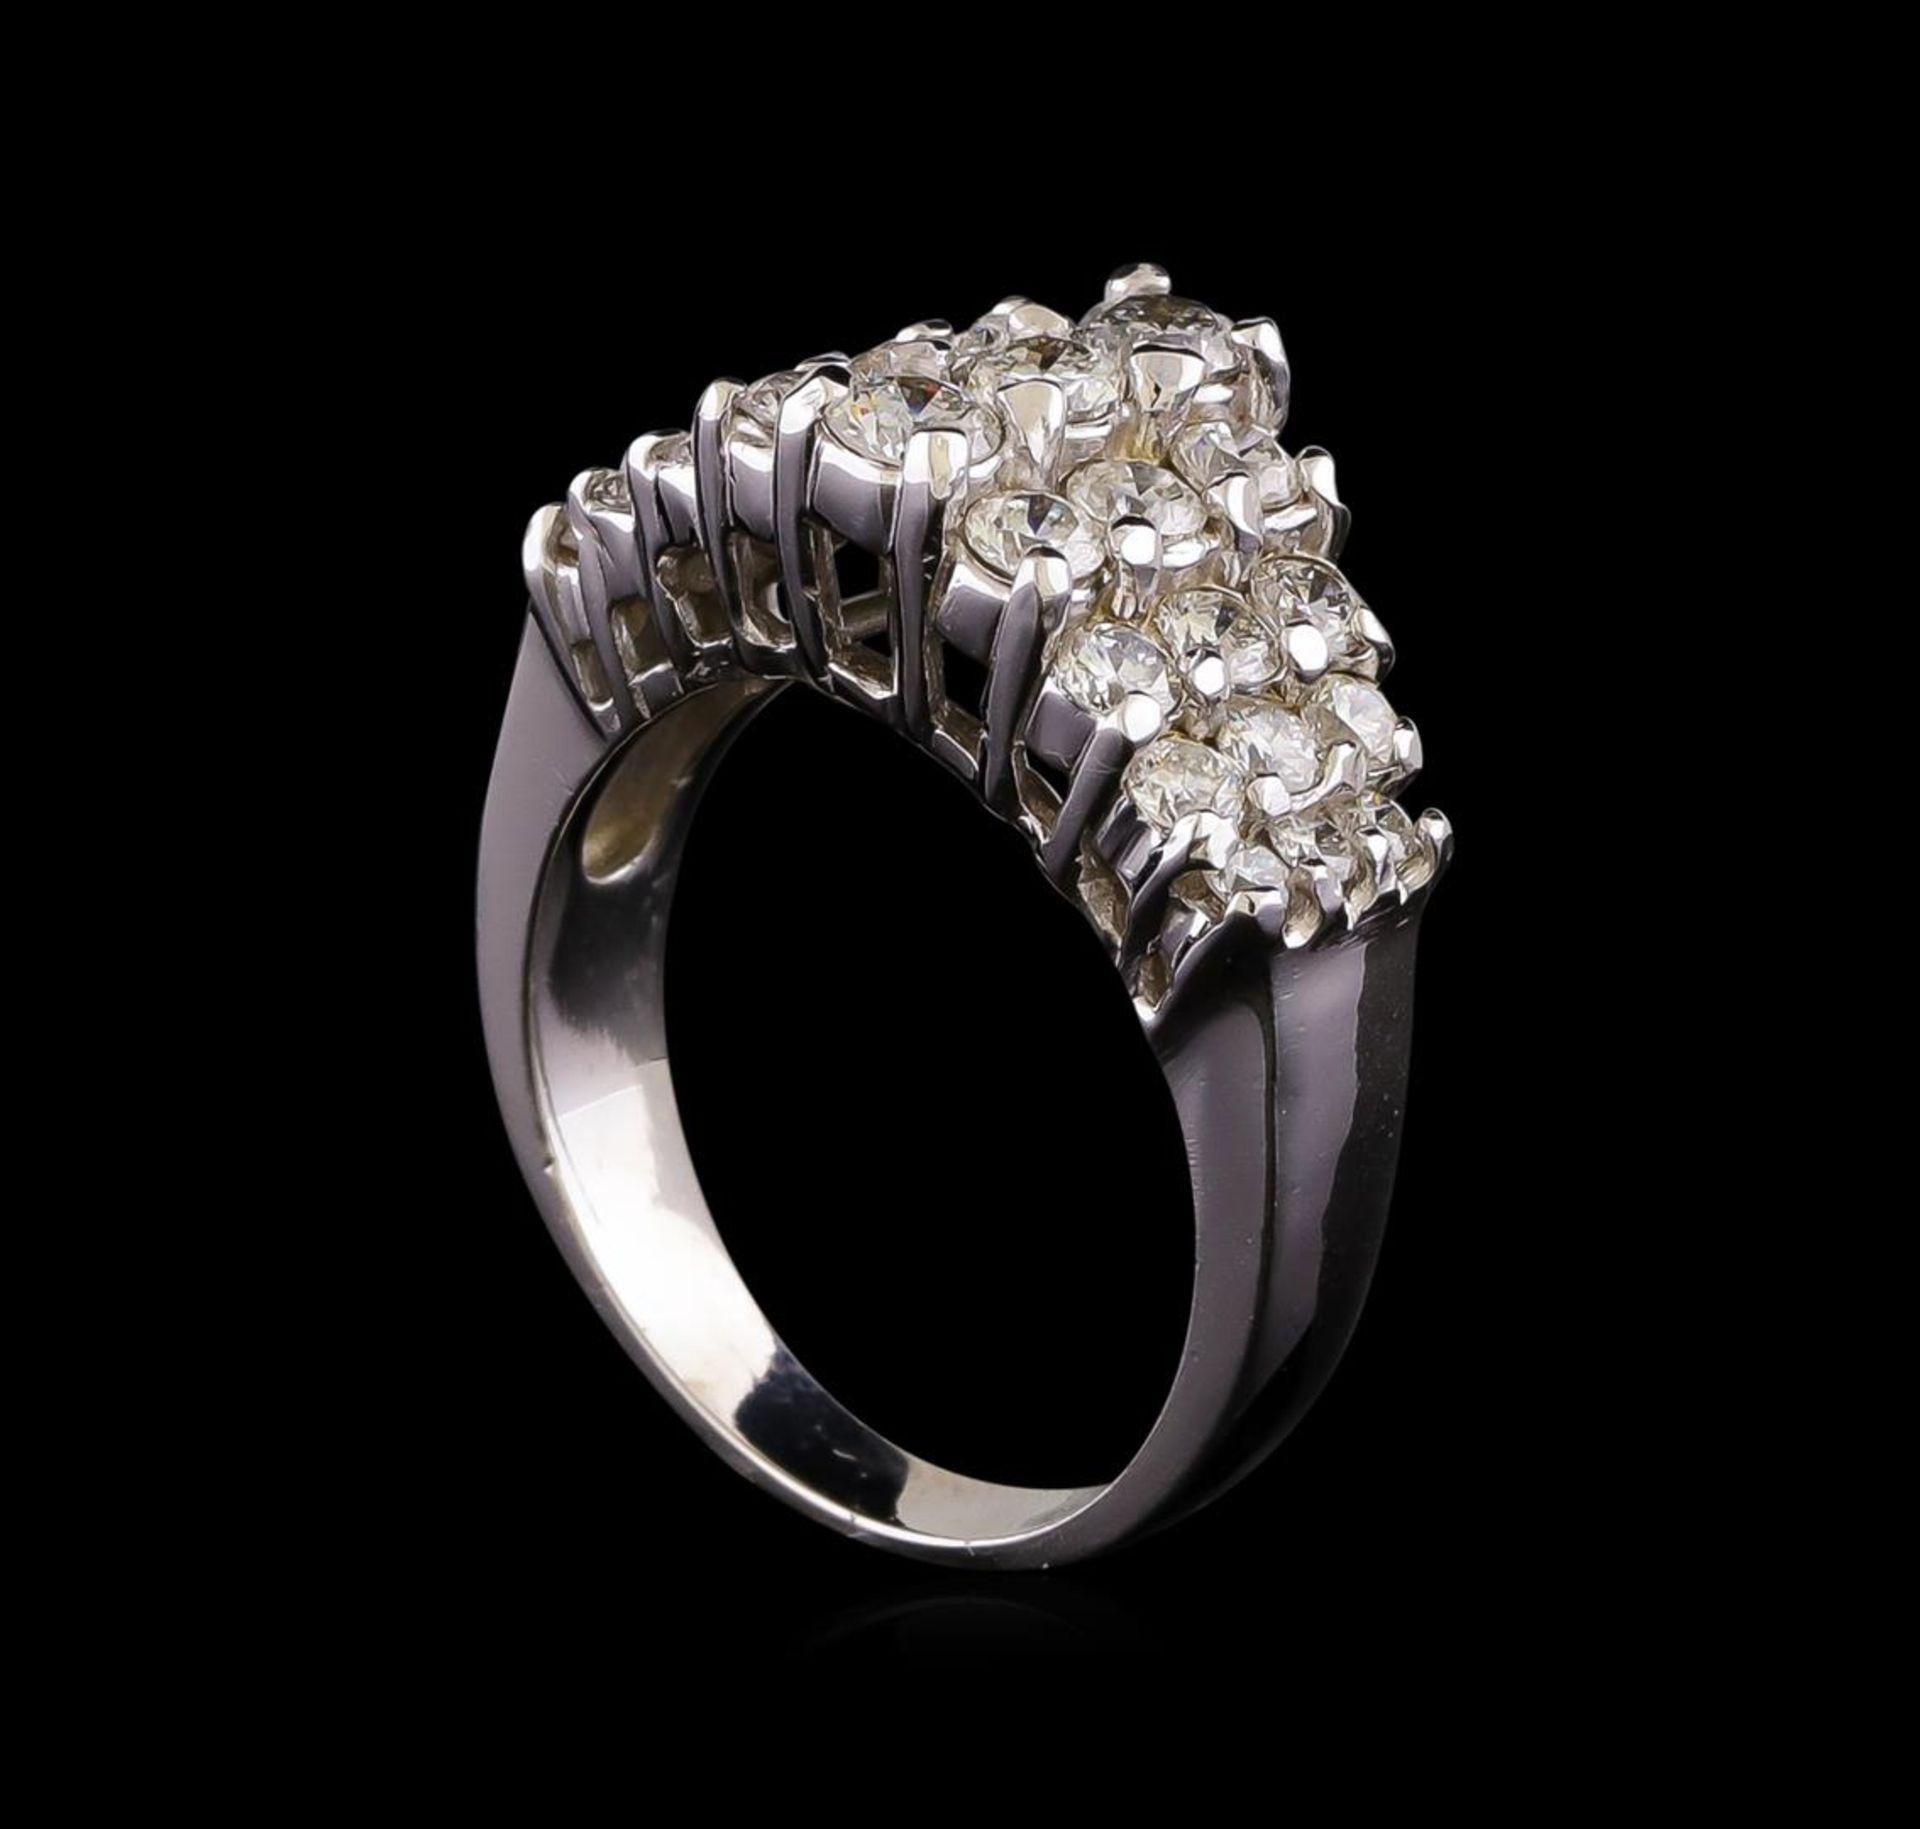 14KT White Gold 1.00 ctw Diamond Ring - Image 4 of 5